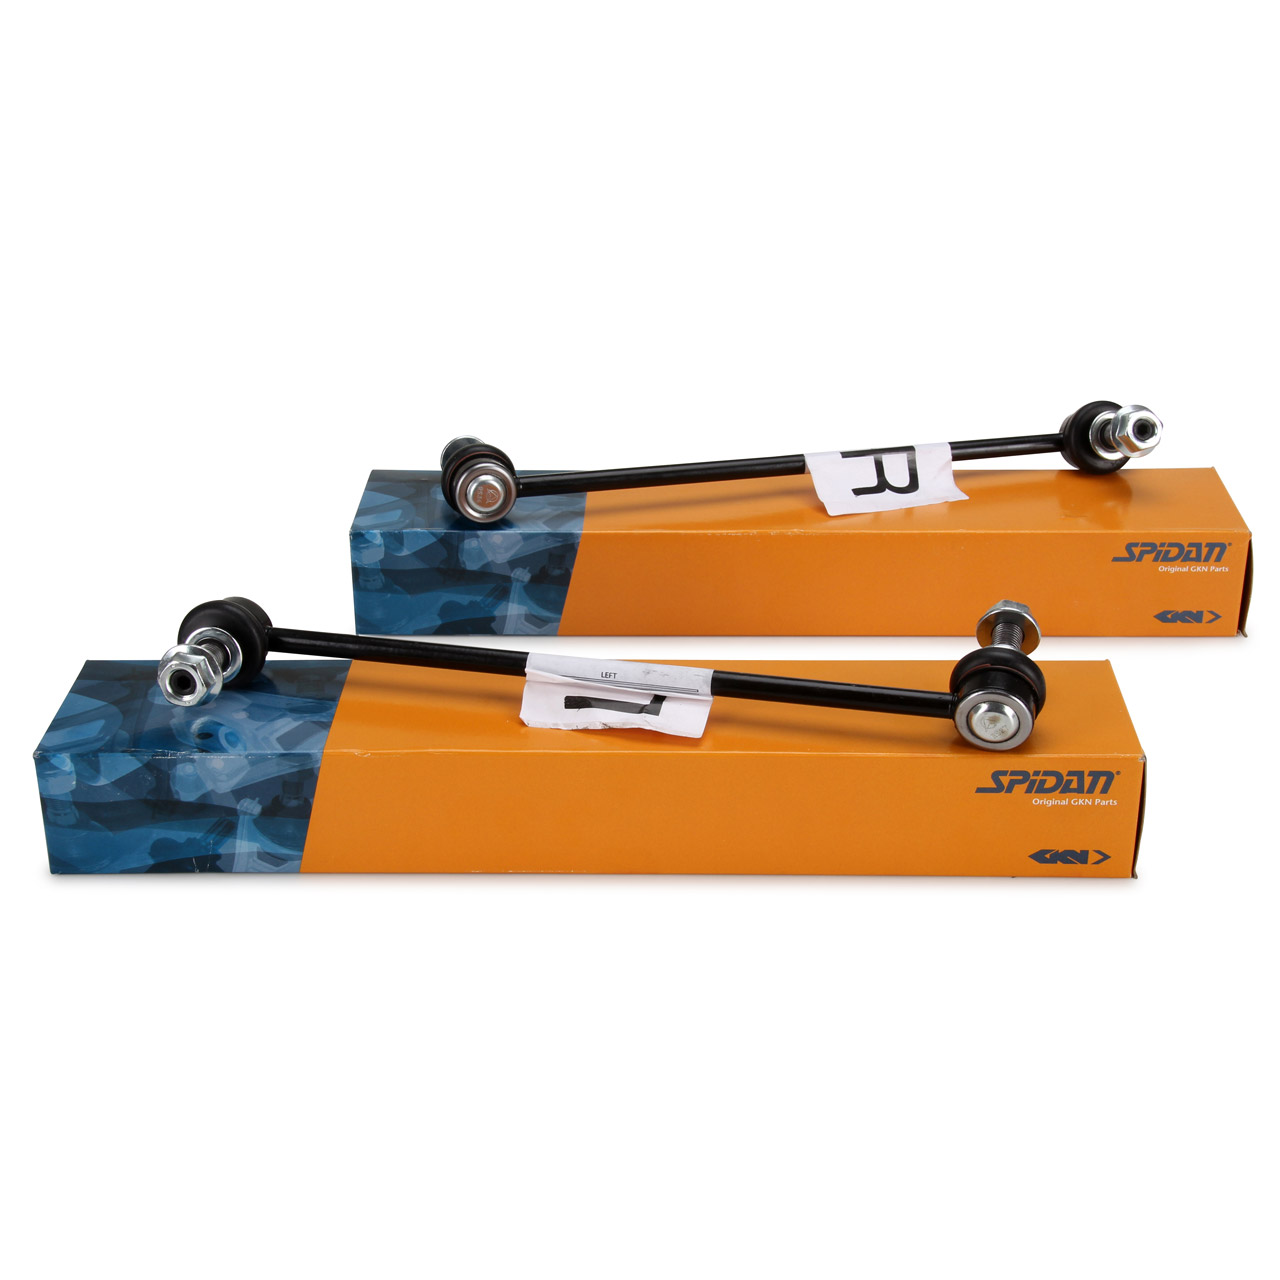 2x SPIDAN Koppelstange Stabilisatorstange Stabistange für OPEL ASTRA K vorne